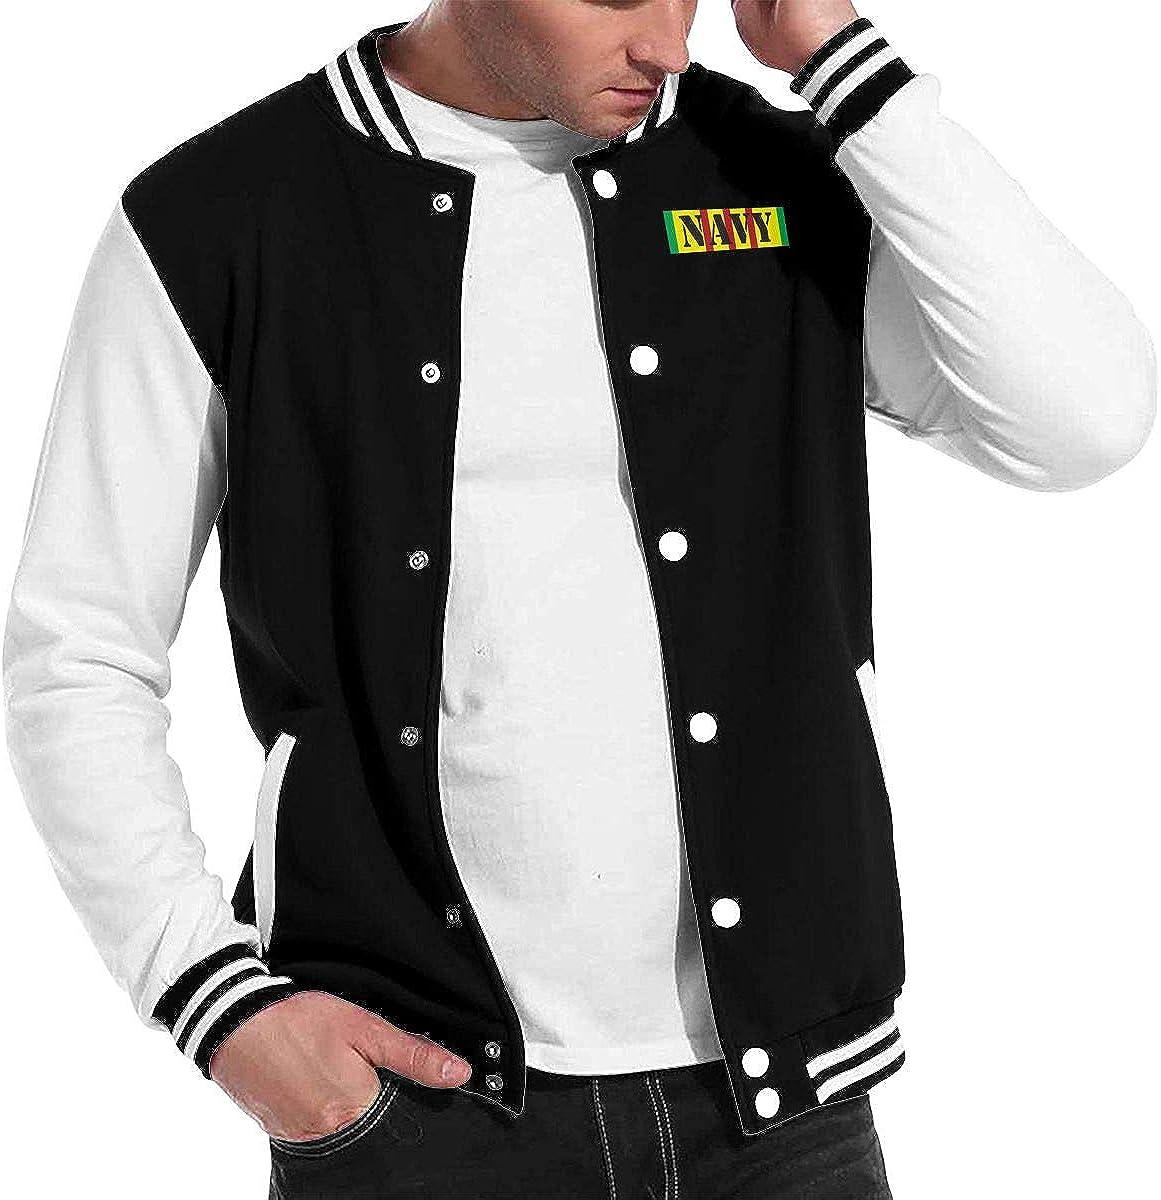 ZGYPBA2BA Vietnam Ribbon Navy Baseball Uniform Jacket Sport Coat